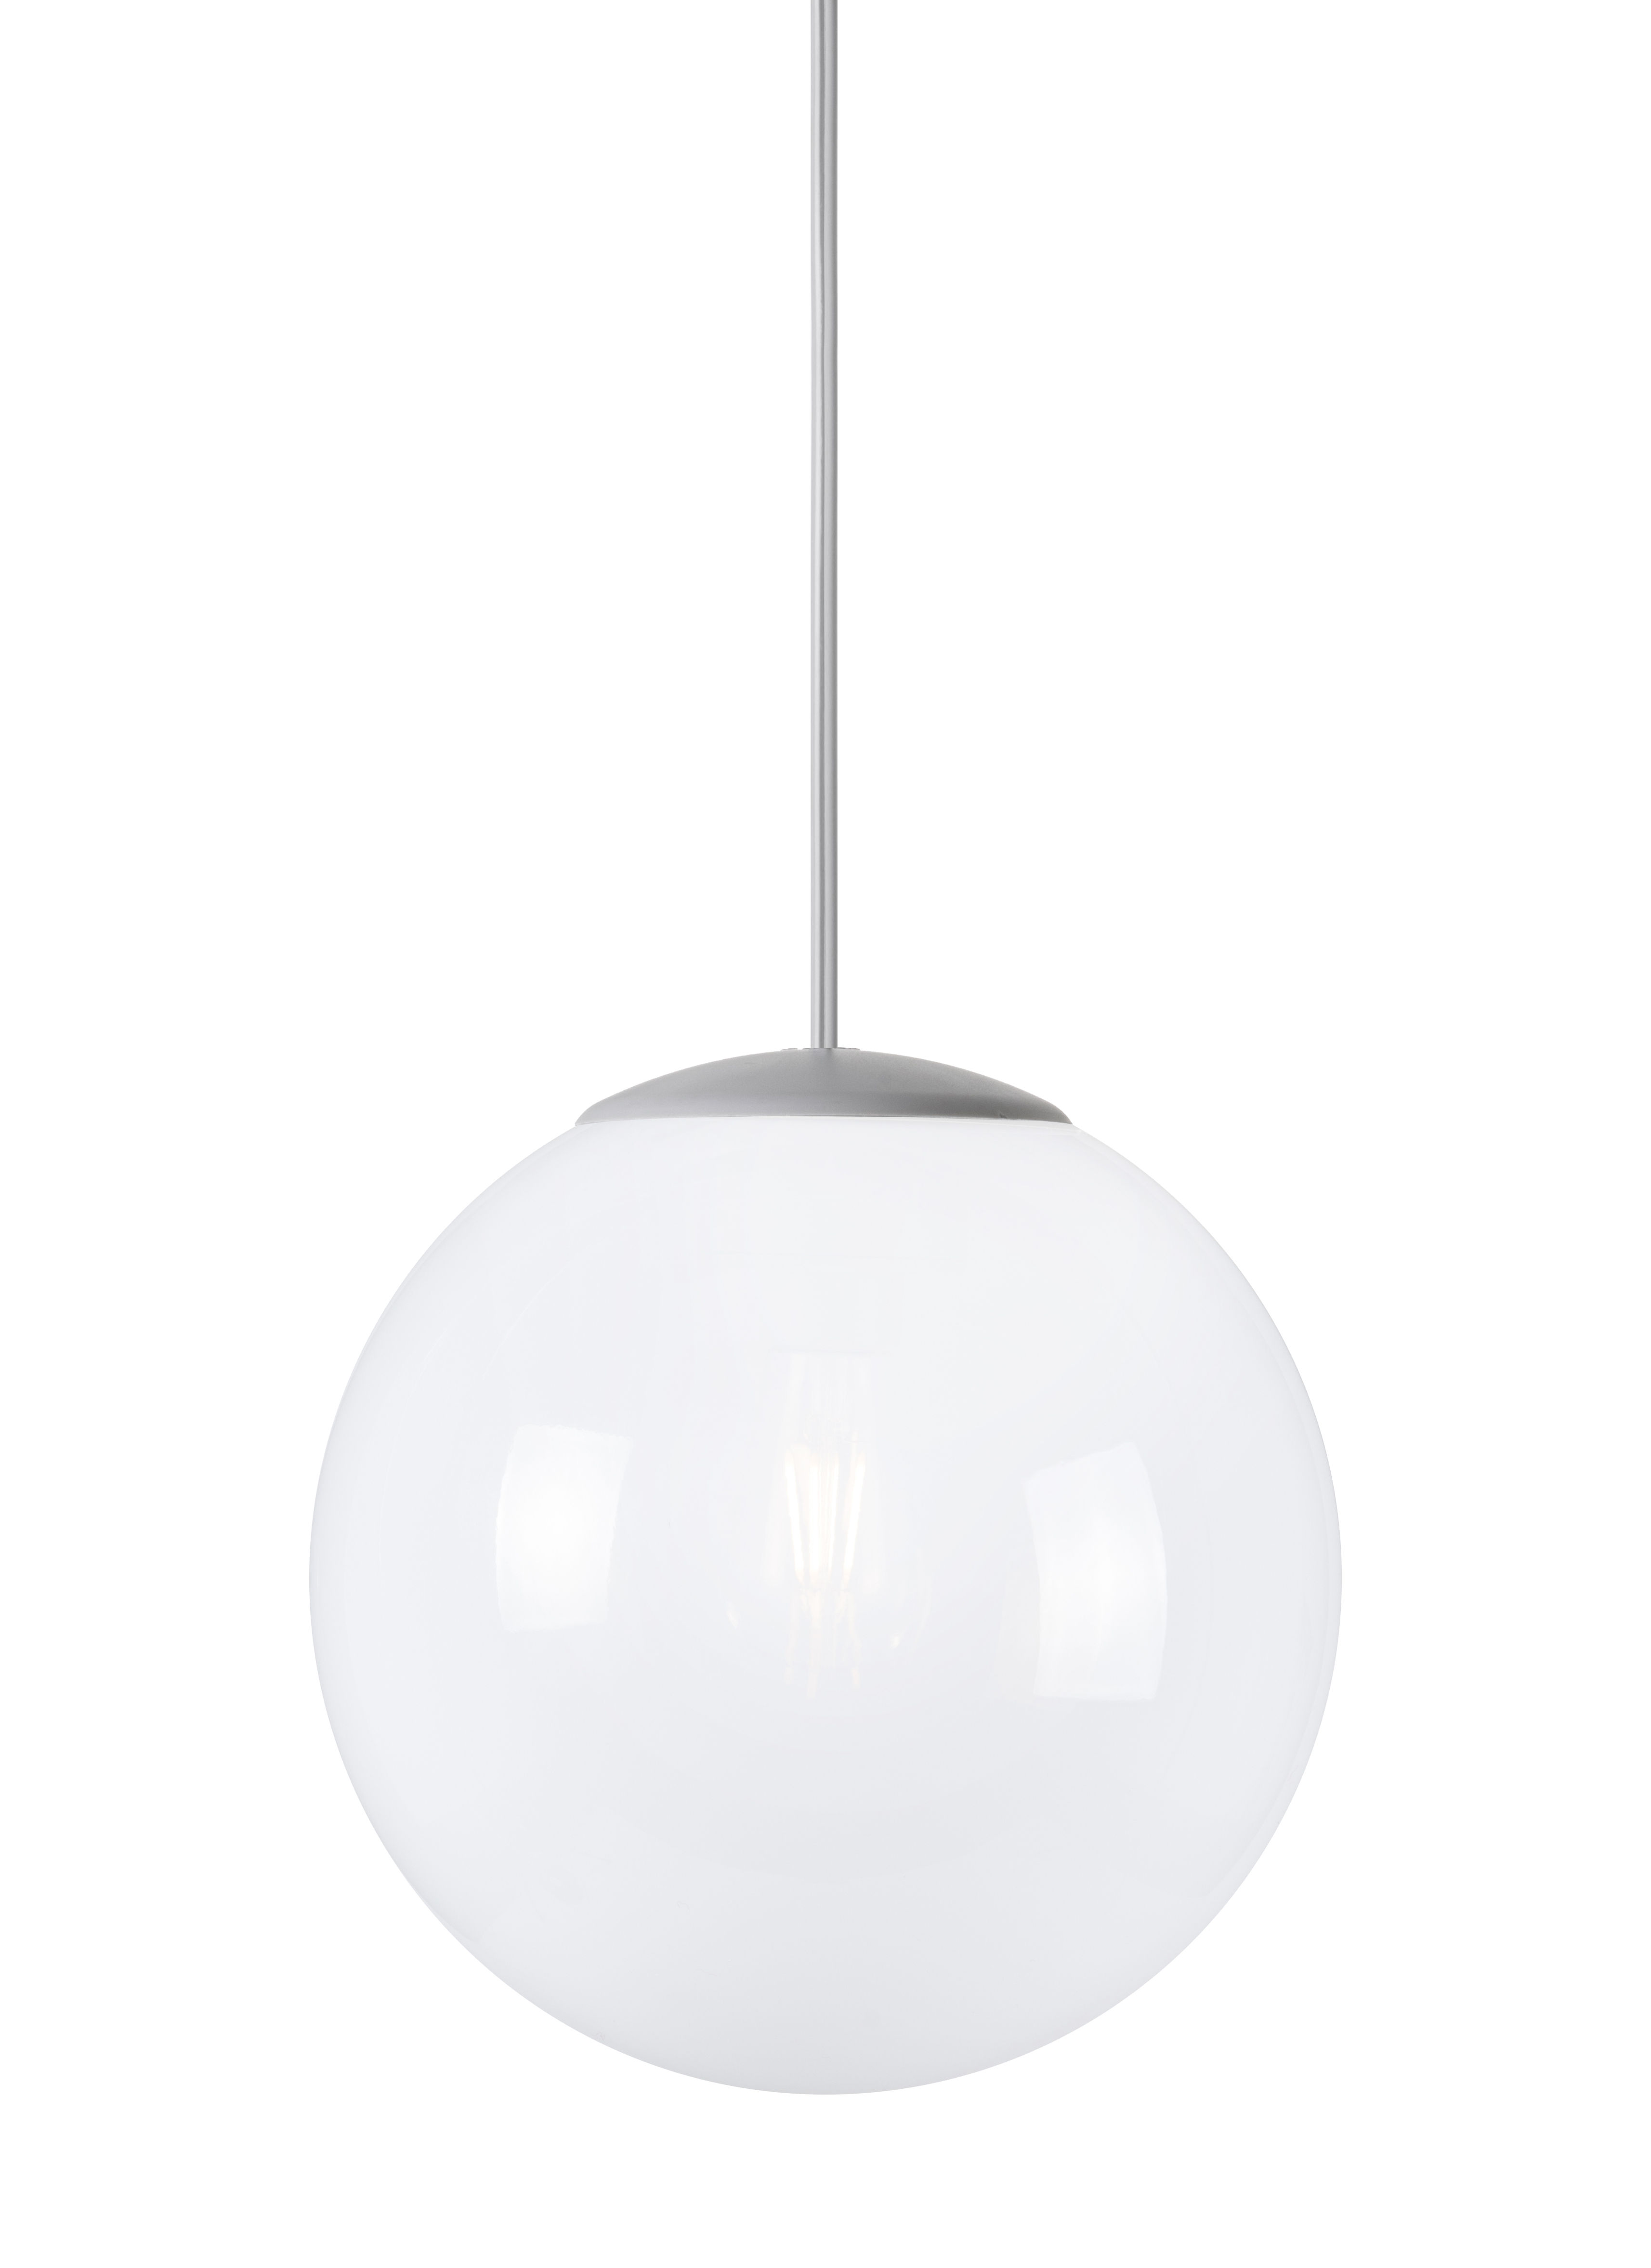 Luminaire Ozcan Finest Nordlux Luminaires U Clairages Scandinaves